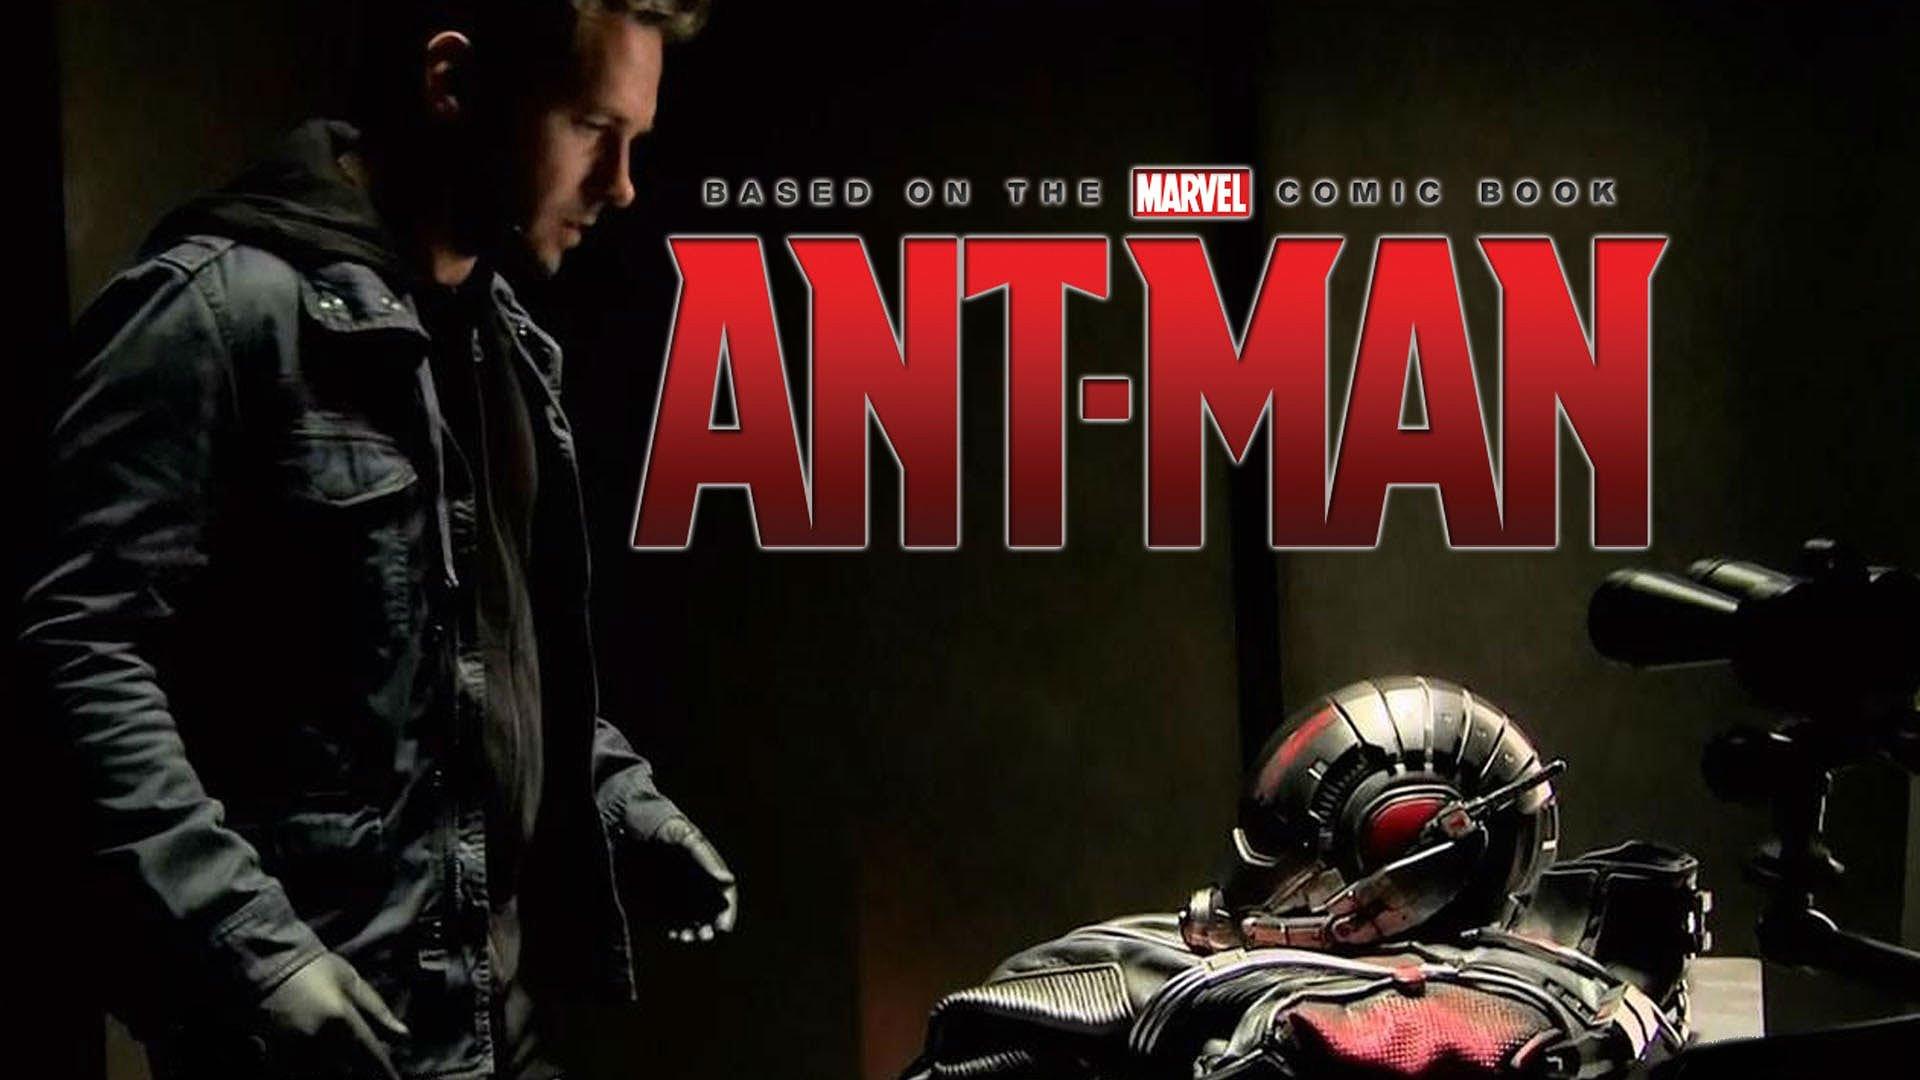 ANT MAN Superhero Action Marvel Comics Ant Man Heroes Hero 1antman Disney Wallpaper